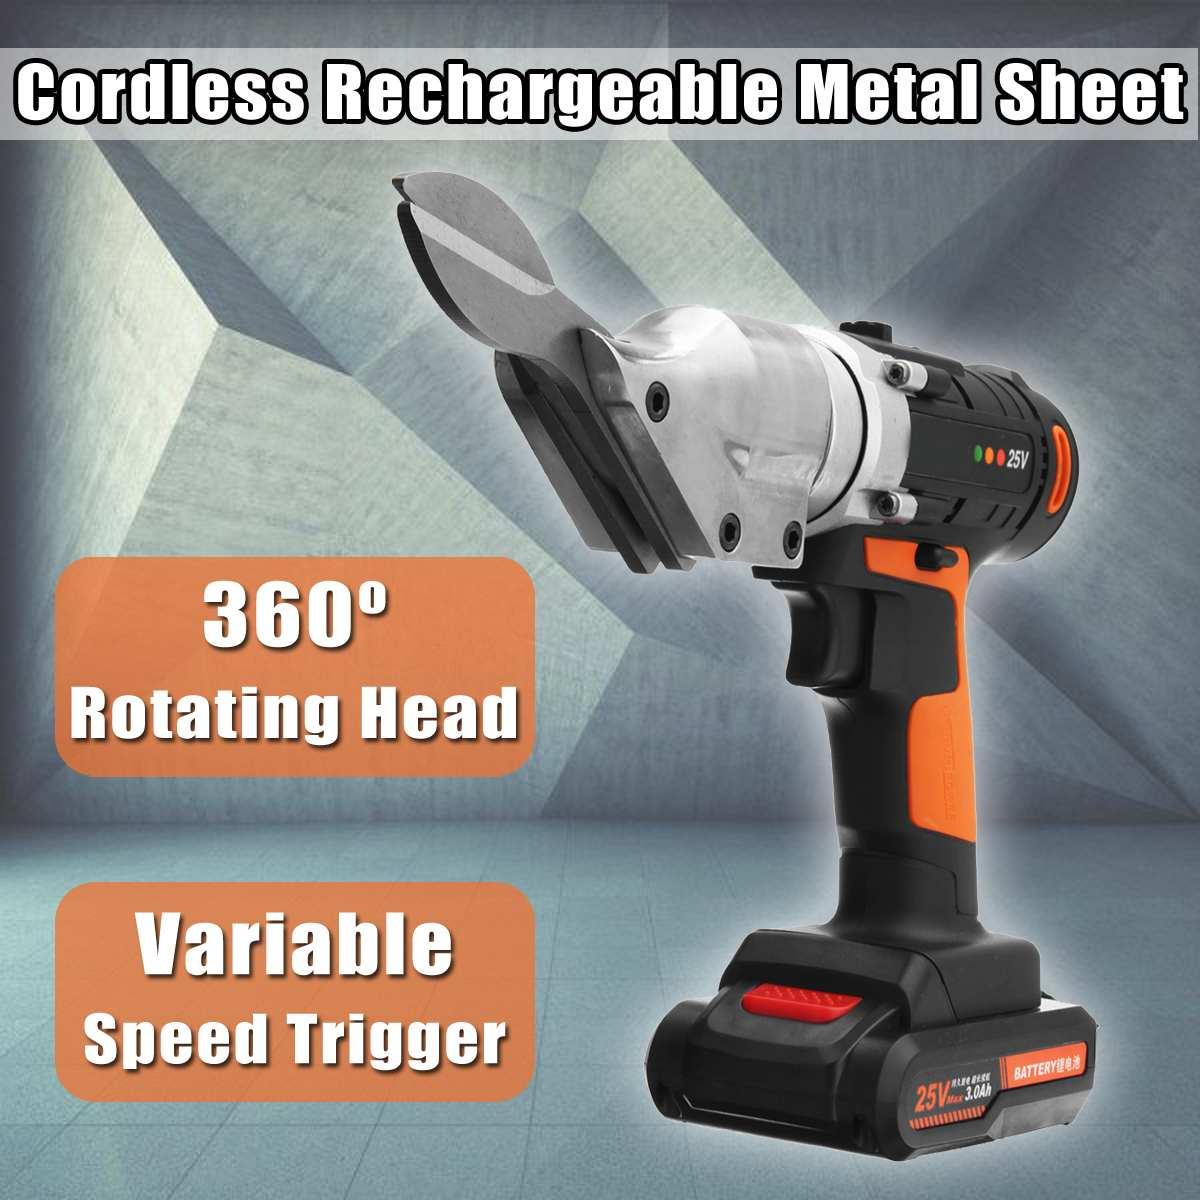 Electric Scissor 25V Li ion Cordless Metal Sheet Shear Cutter Scissors Rechargeable 2 Battery Rotating Head Power Tool